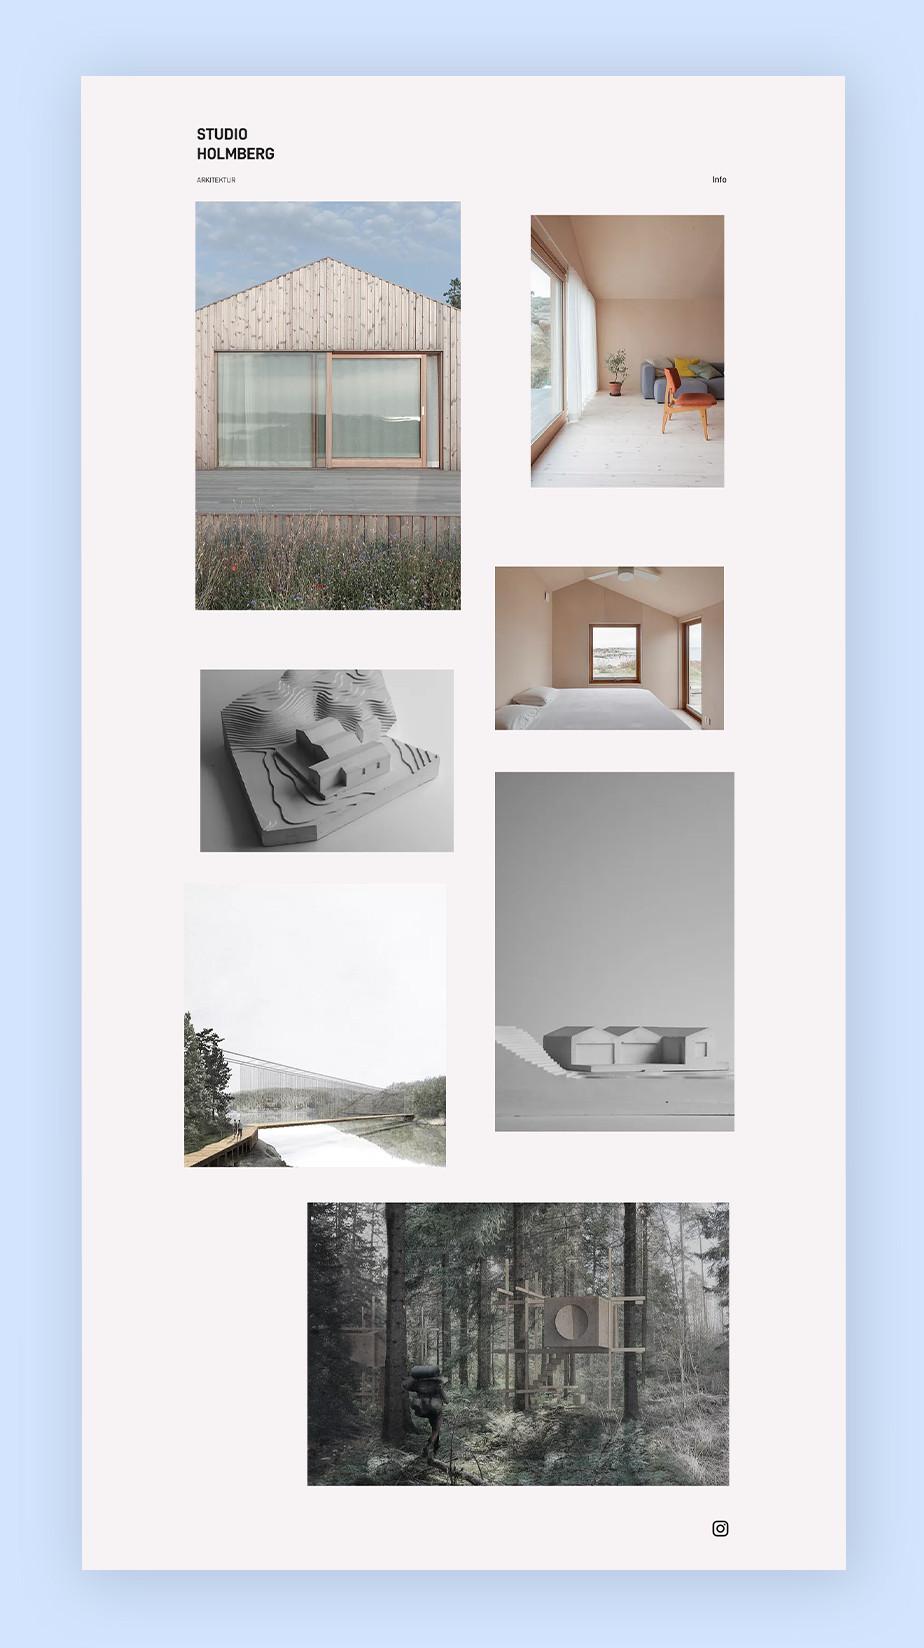 architecture portfolio website example by Mathias Holmberg